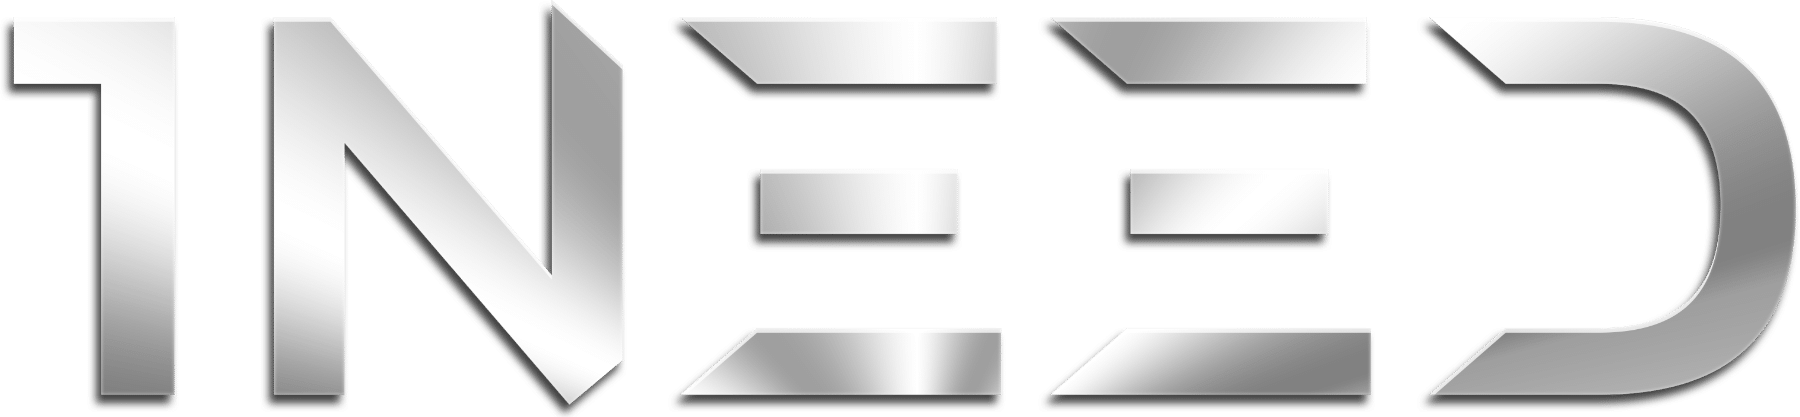 1need-metal-logo_opt